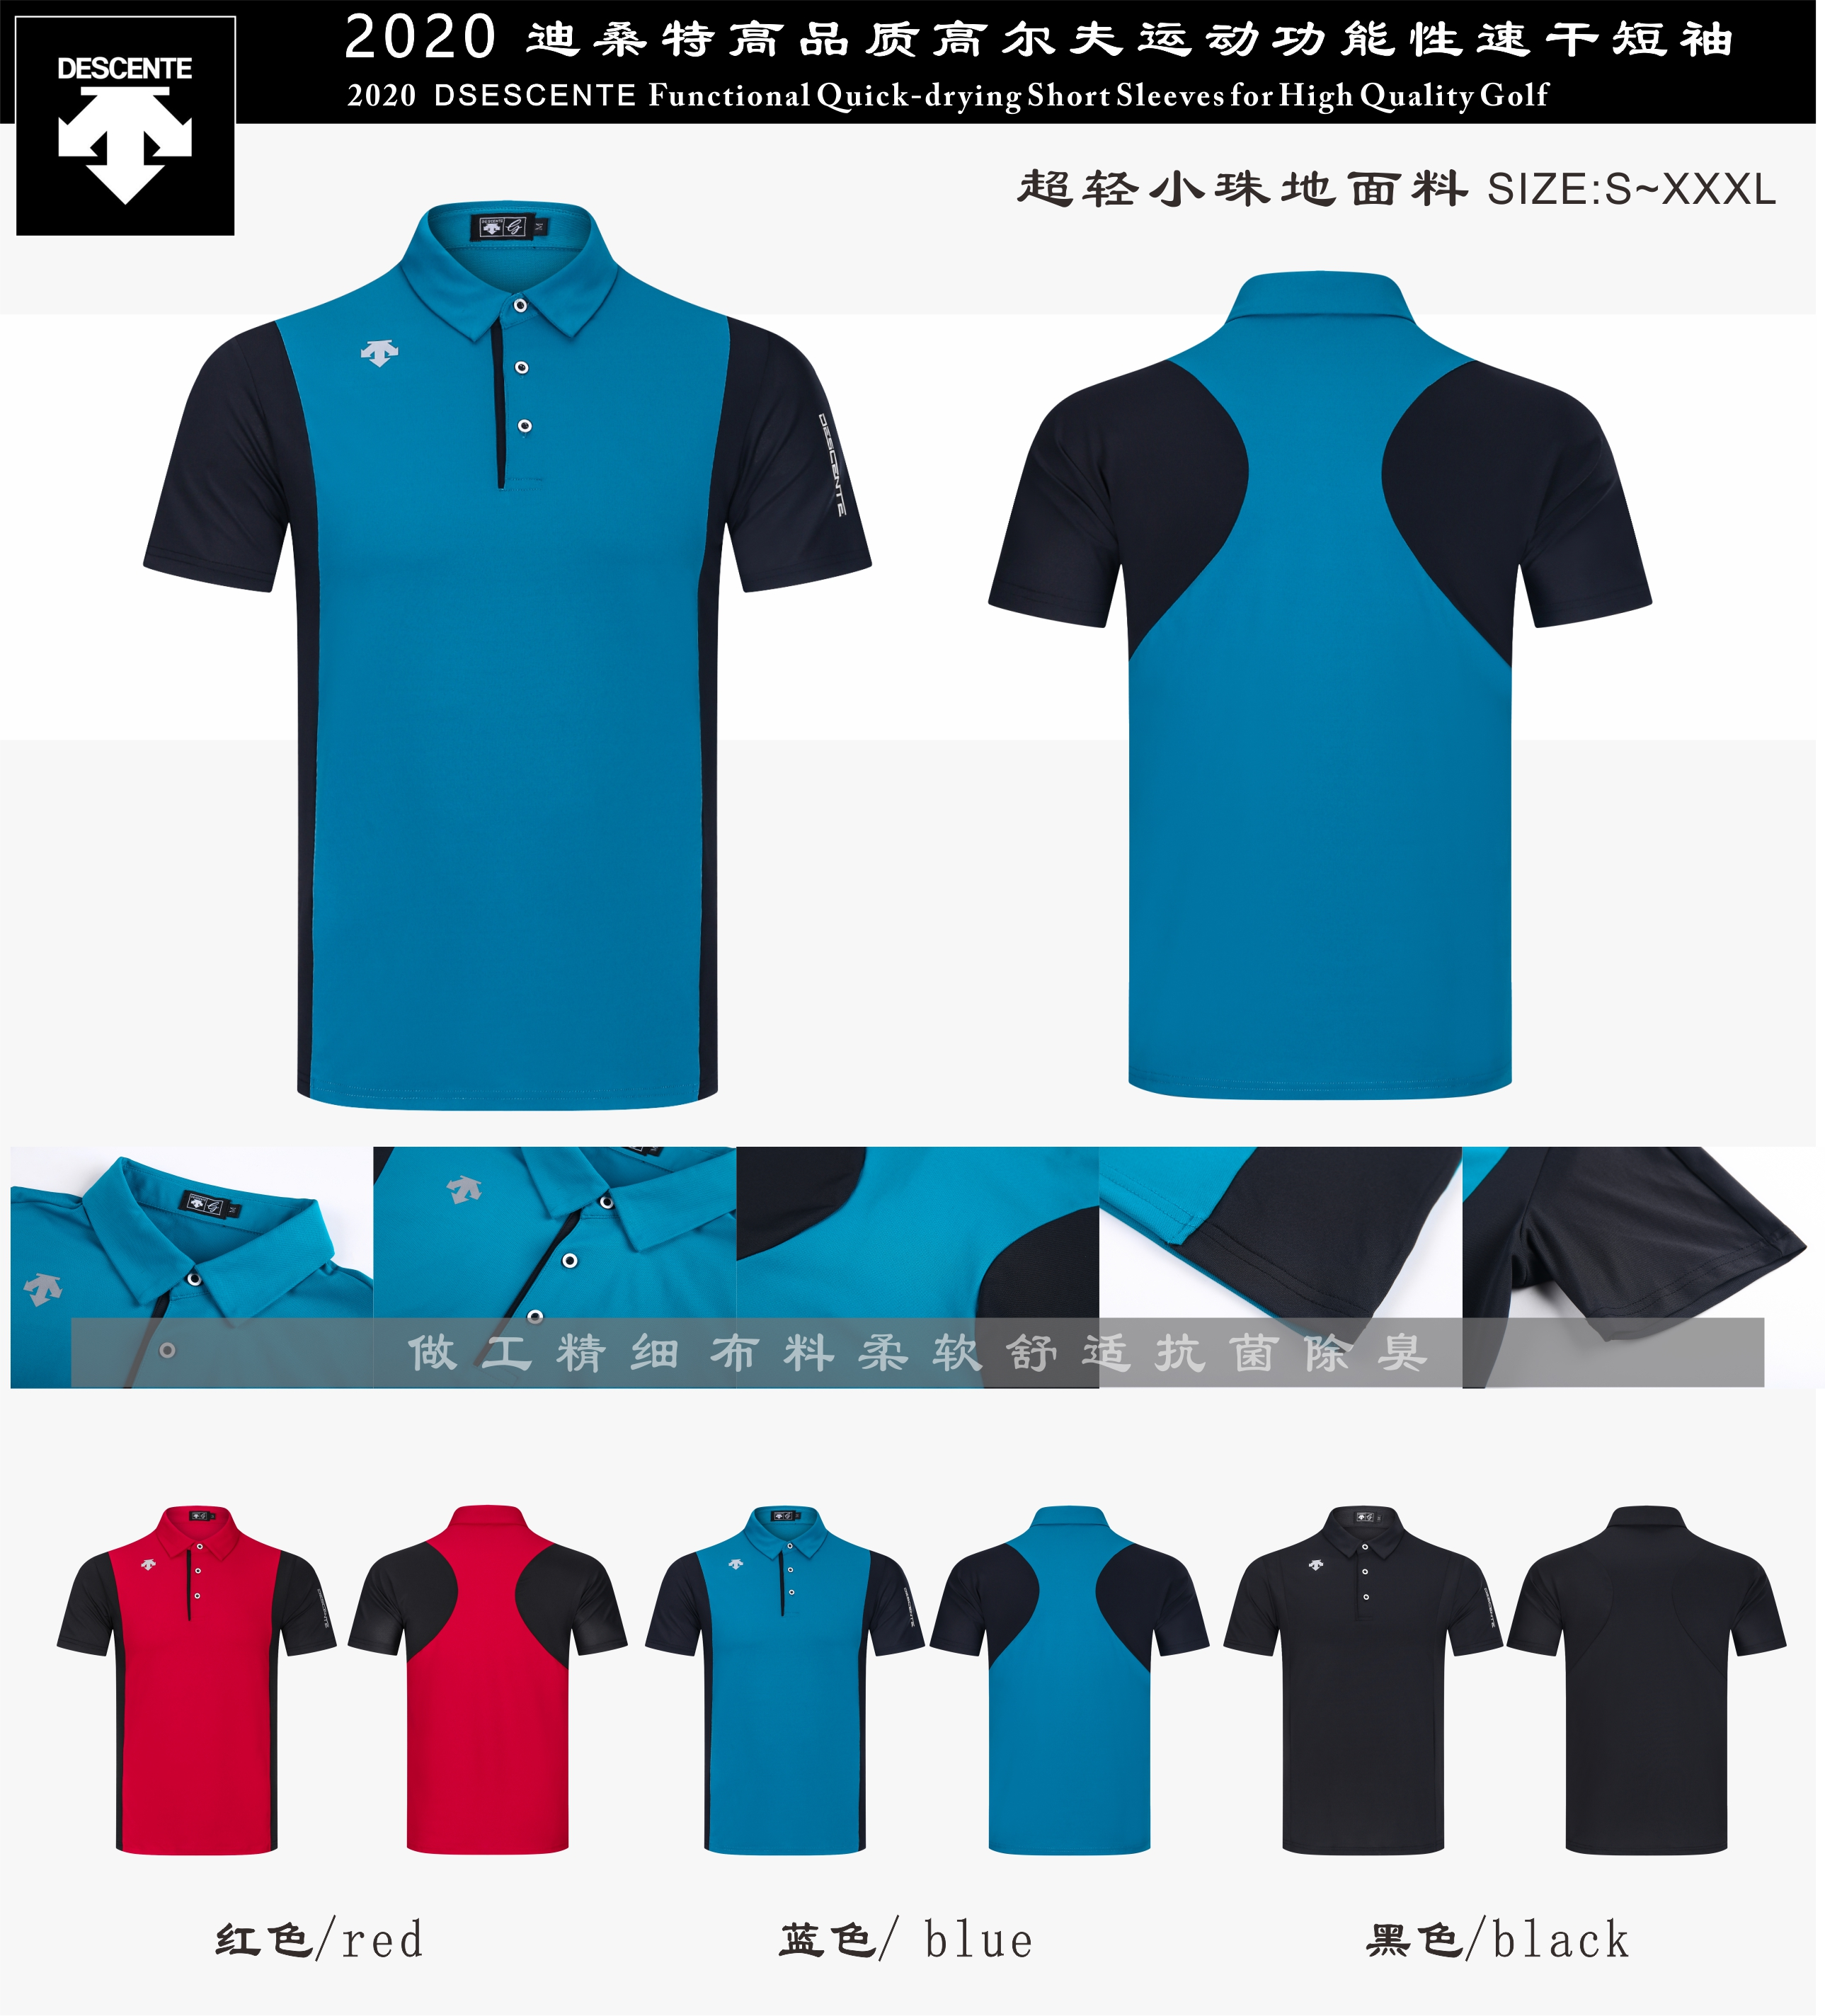 2020new Spring Men Golf Shirt Short Sleeve Quick Dry Turndown Collar Golf Clothing